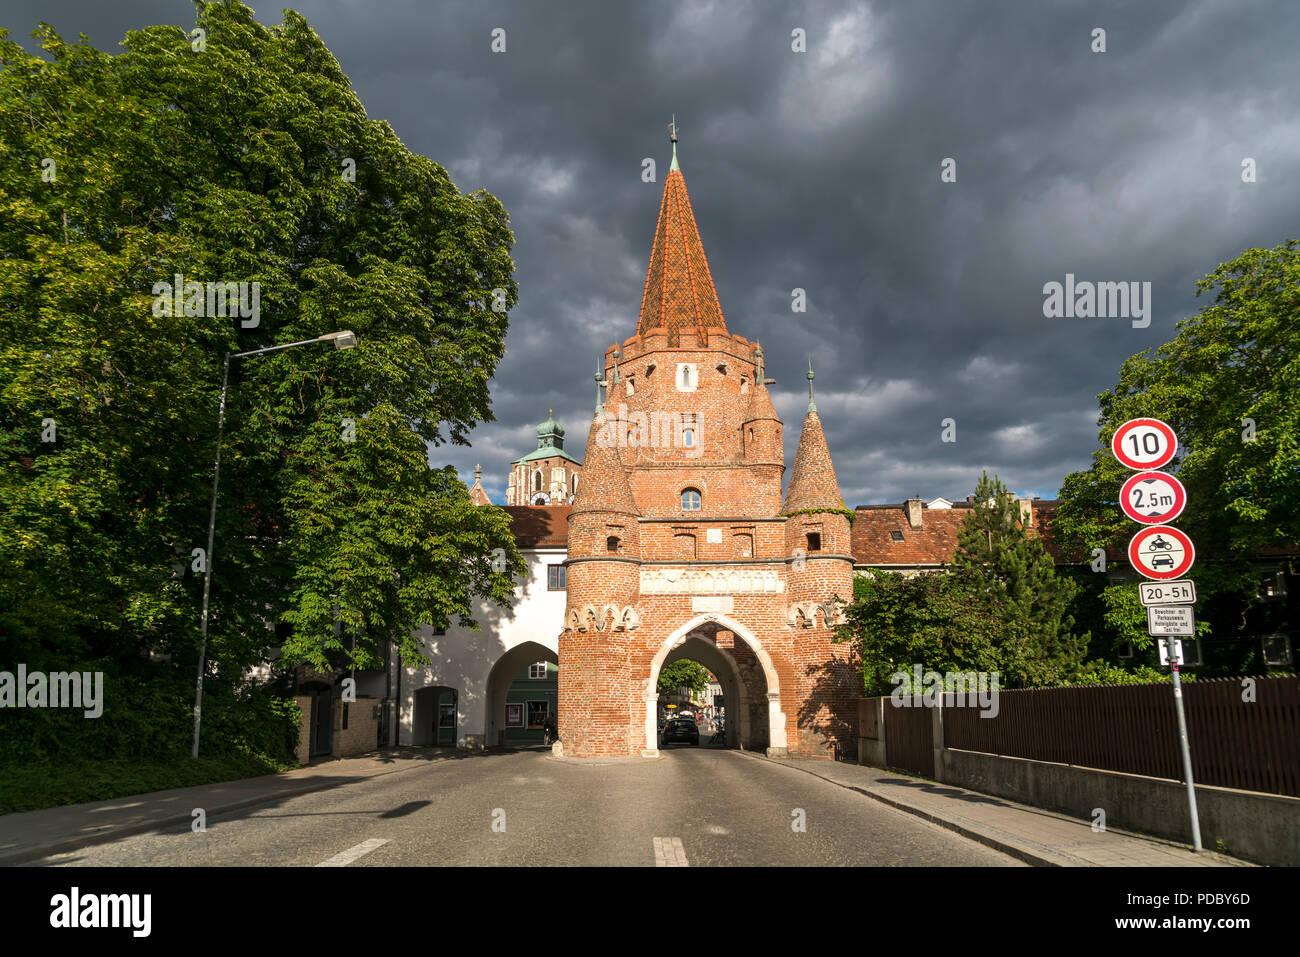 Wahrzeichen Kreuztor, Ingolstadt, Oberbayern, Bayern, Deutschland   Landmark Kreuztor,  Ingolstadt, Upper Bavaria, Bavaria, Germany, Europe - Stock Image